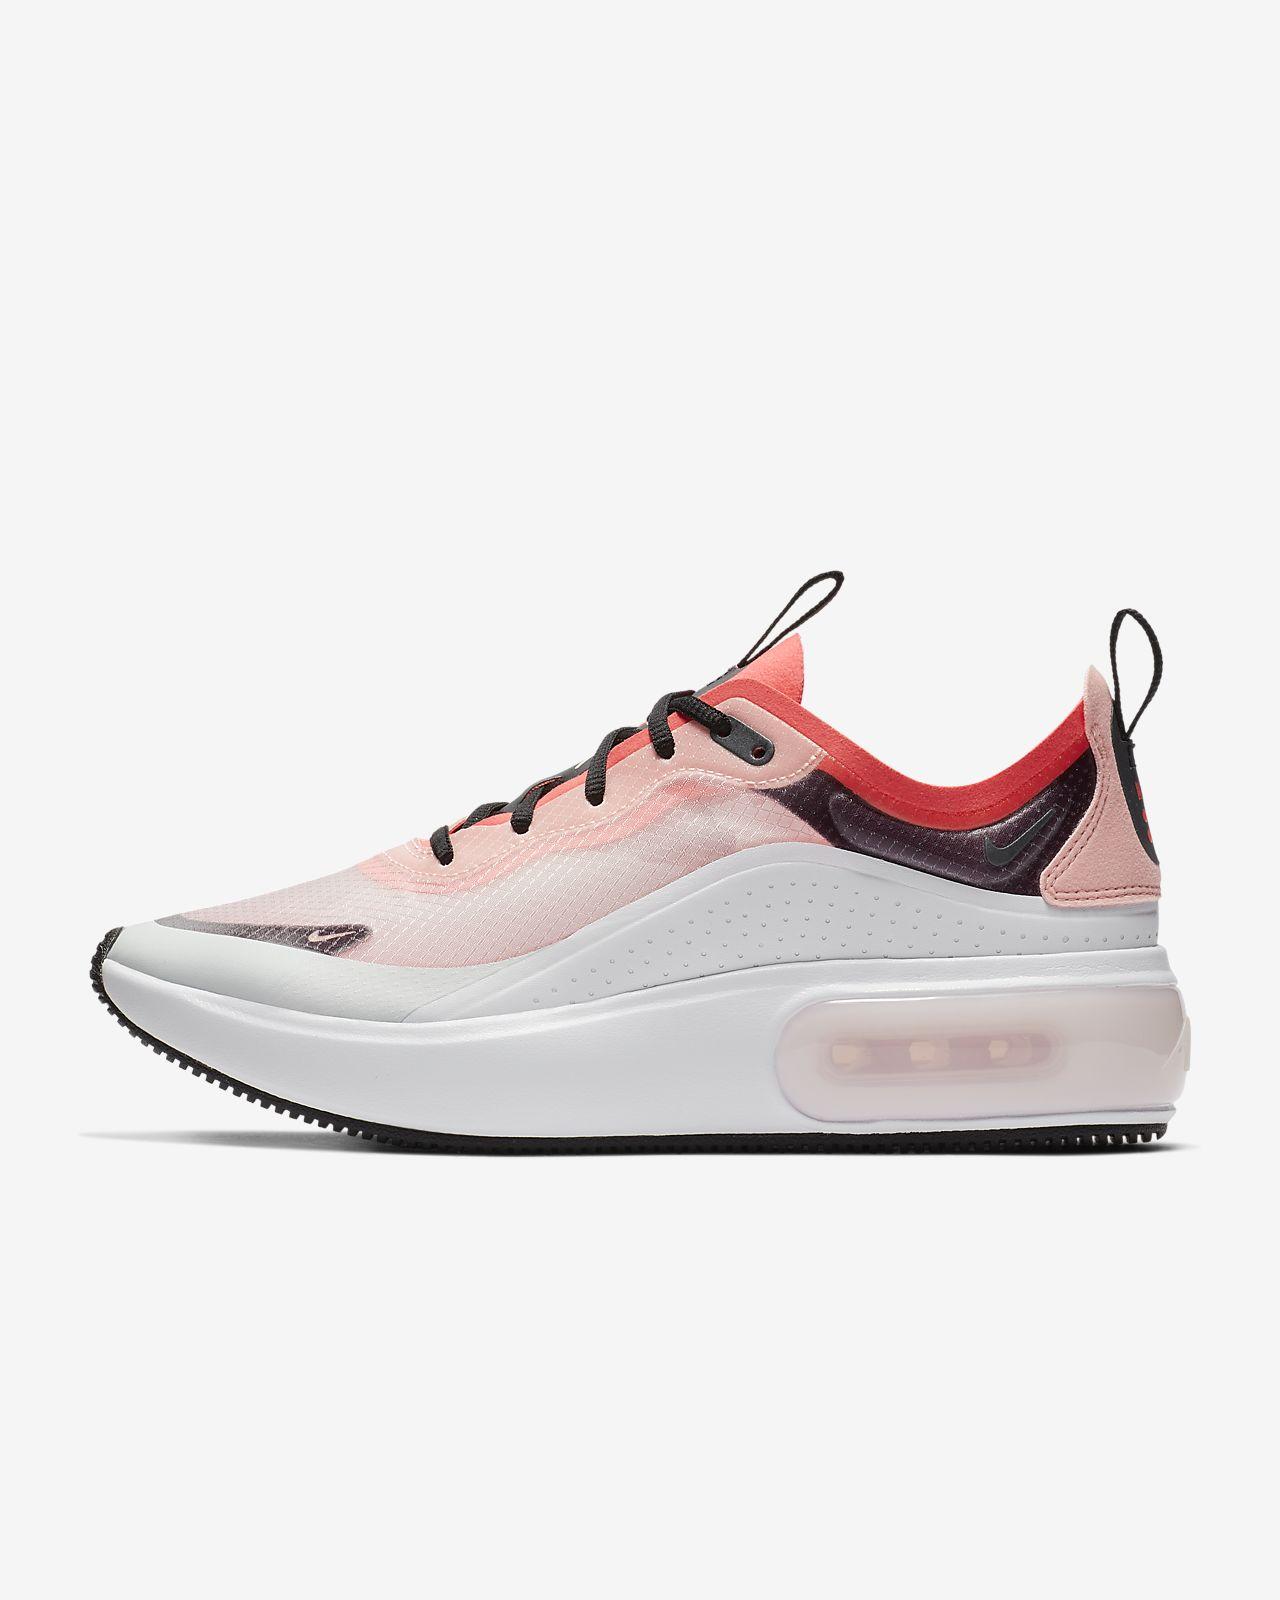 74bb5aa822bd28 Nike Air Max Dia SE QS Women s Shoe. Nike.com GB